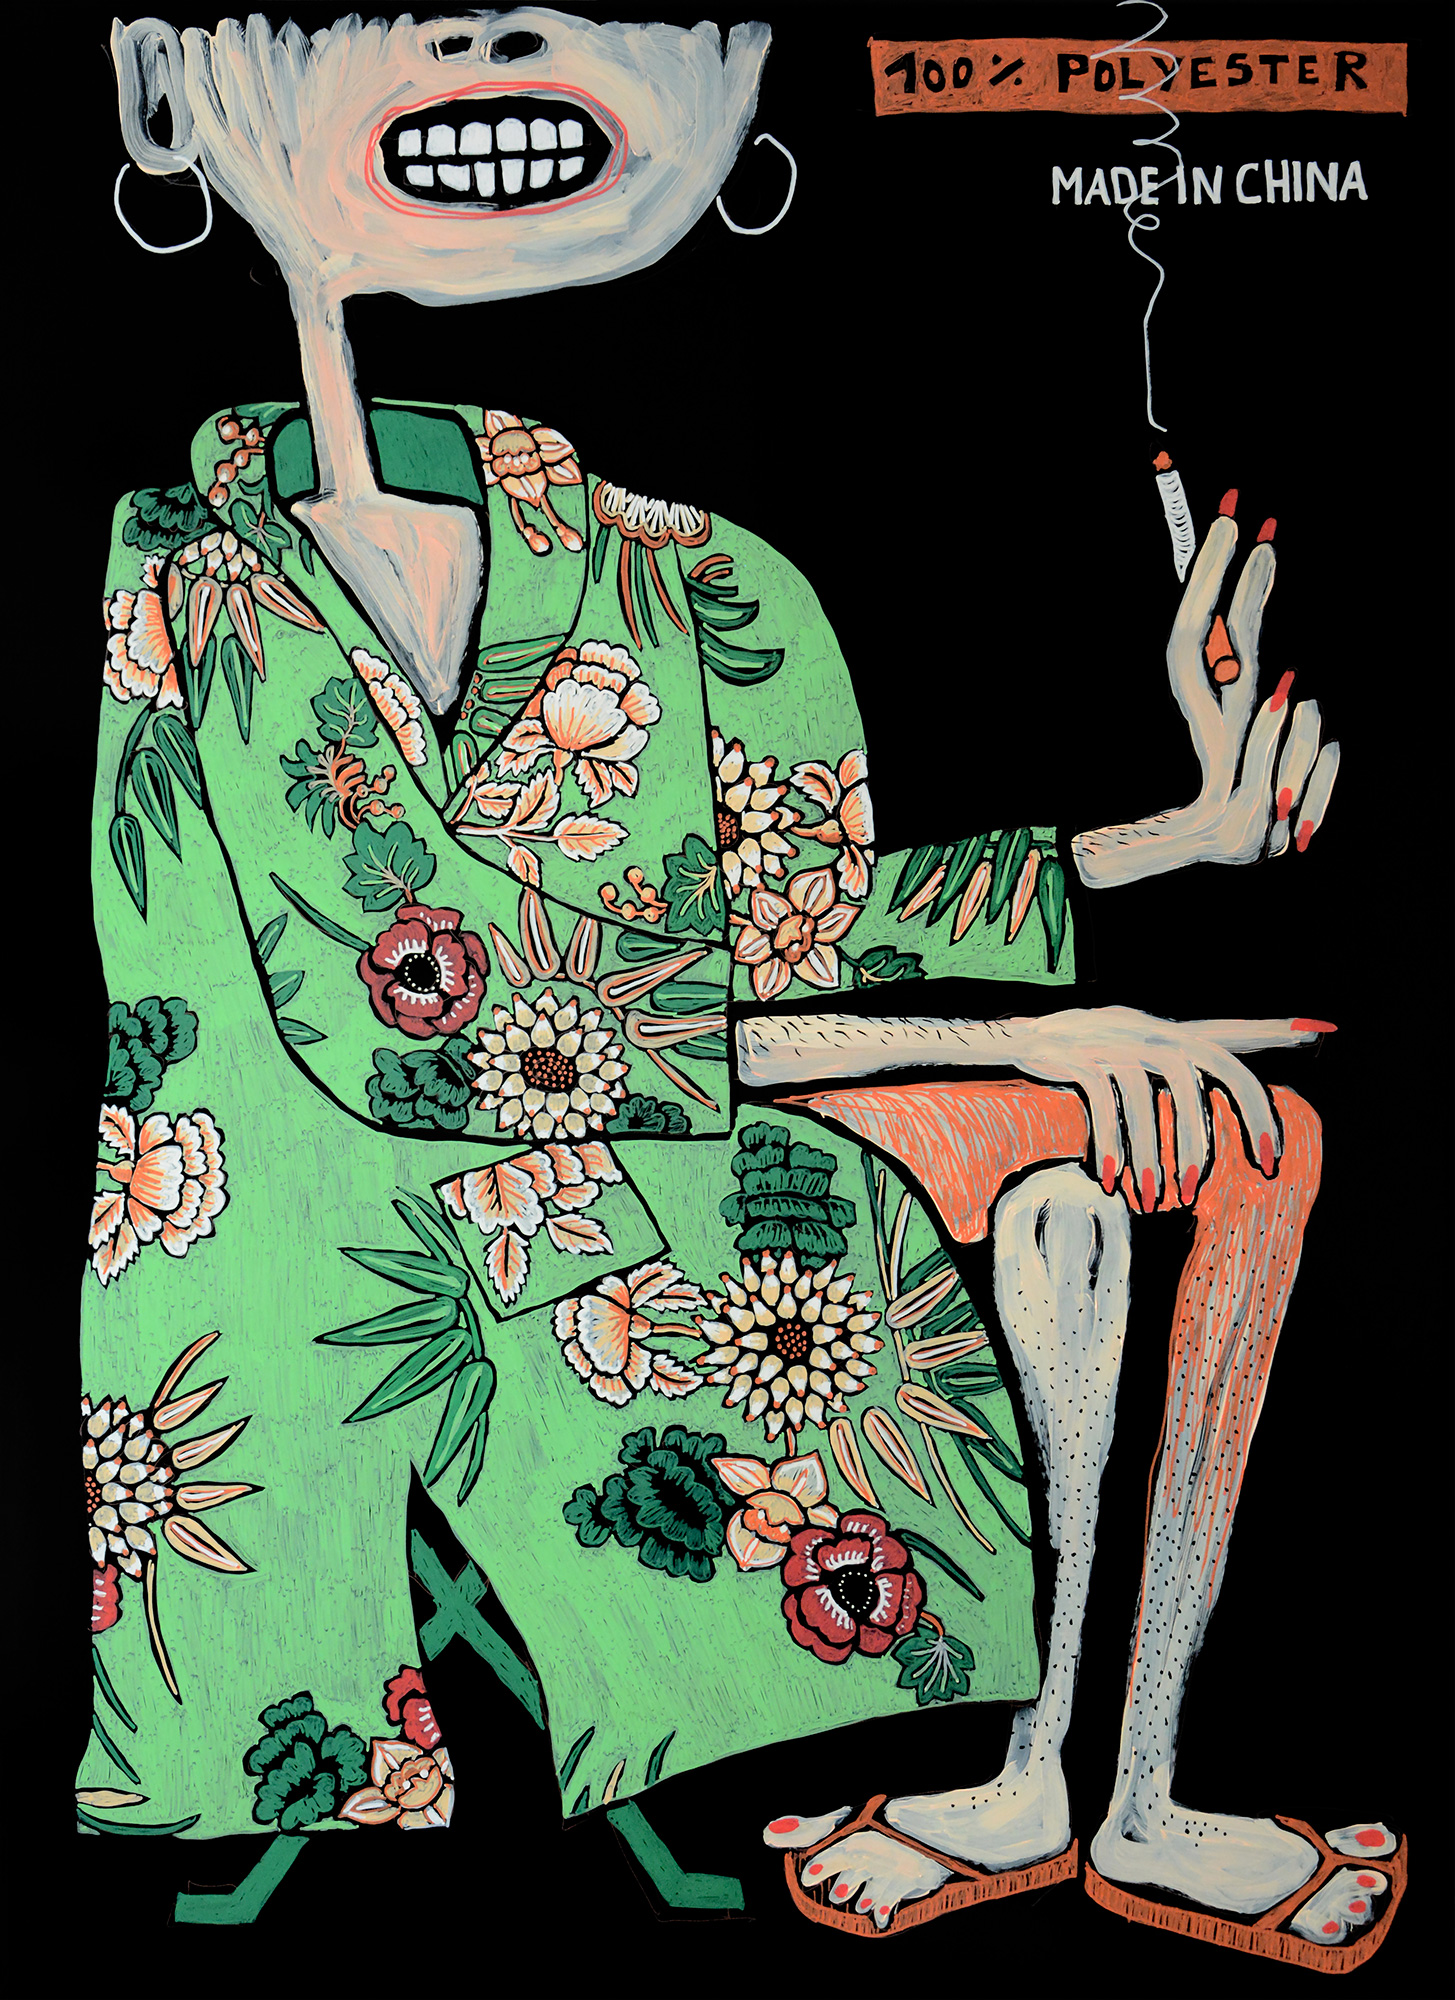 Katharina Arndt – 100% Polyester